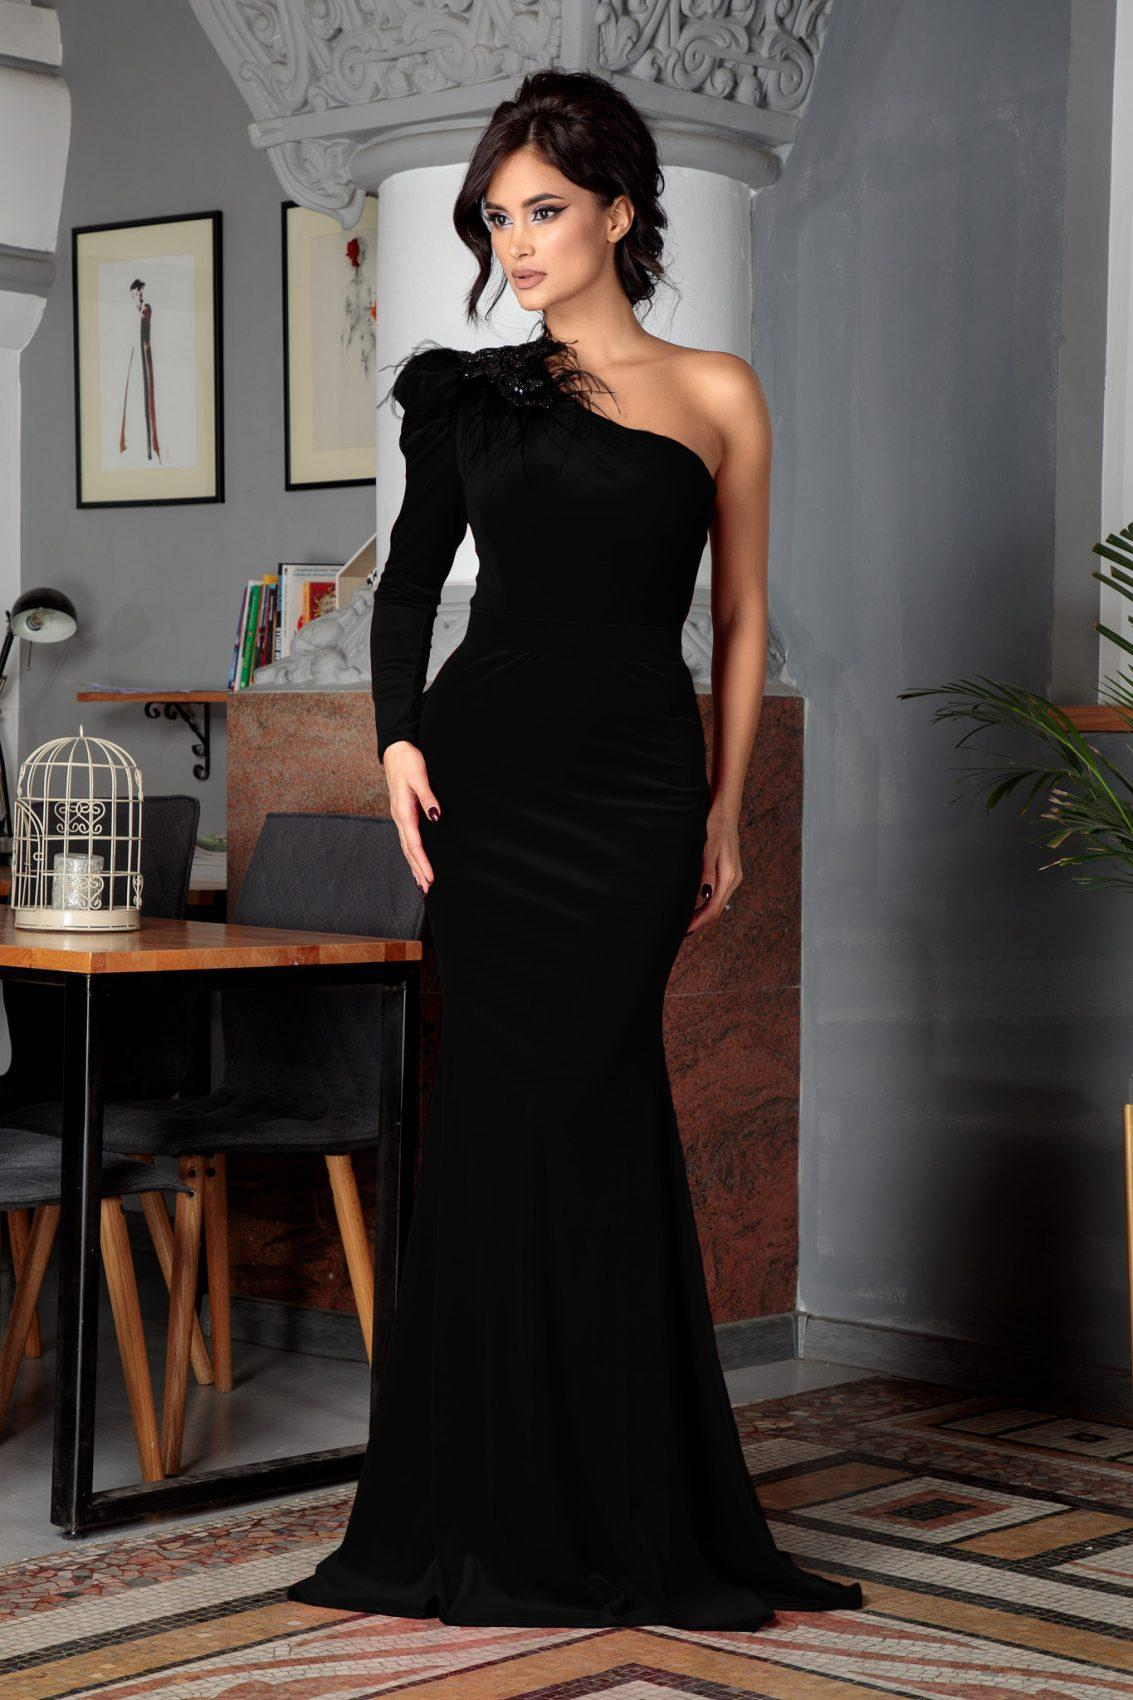 Impulse Black Dress